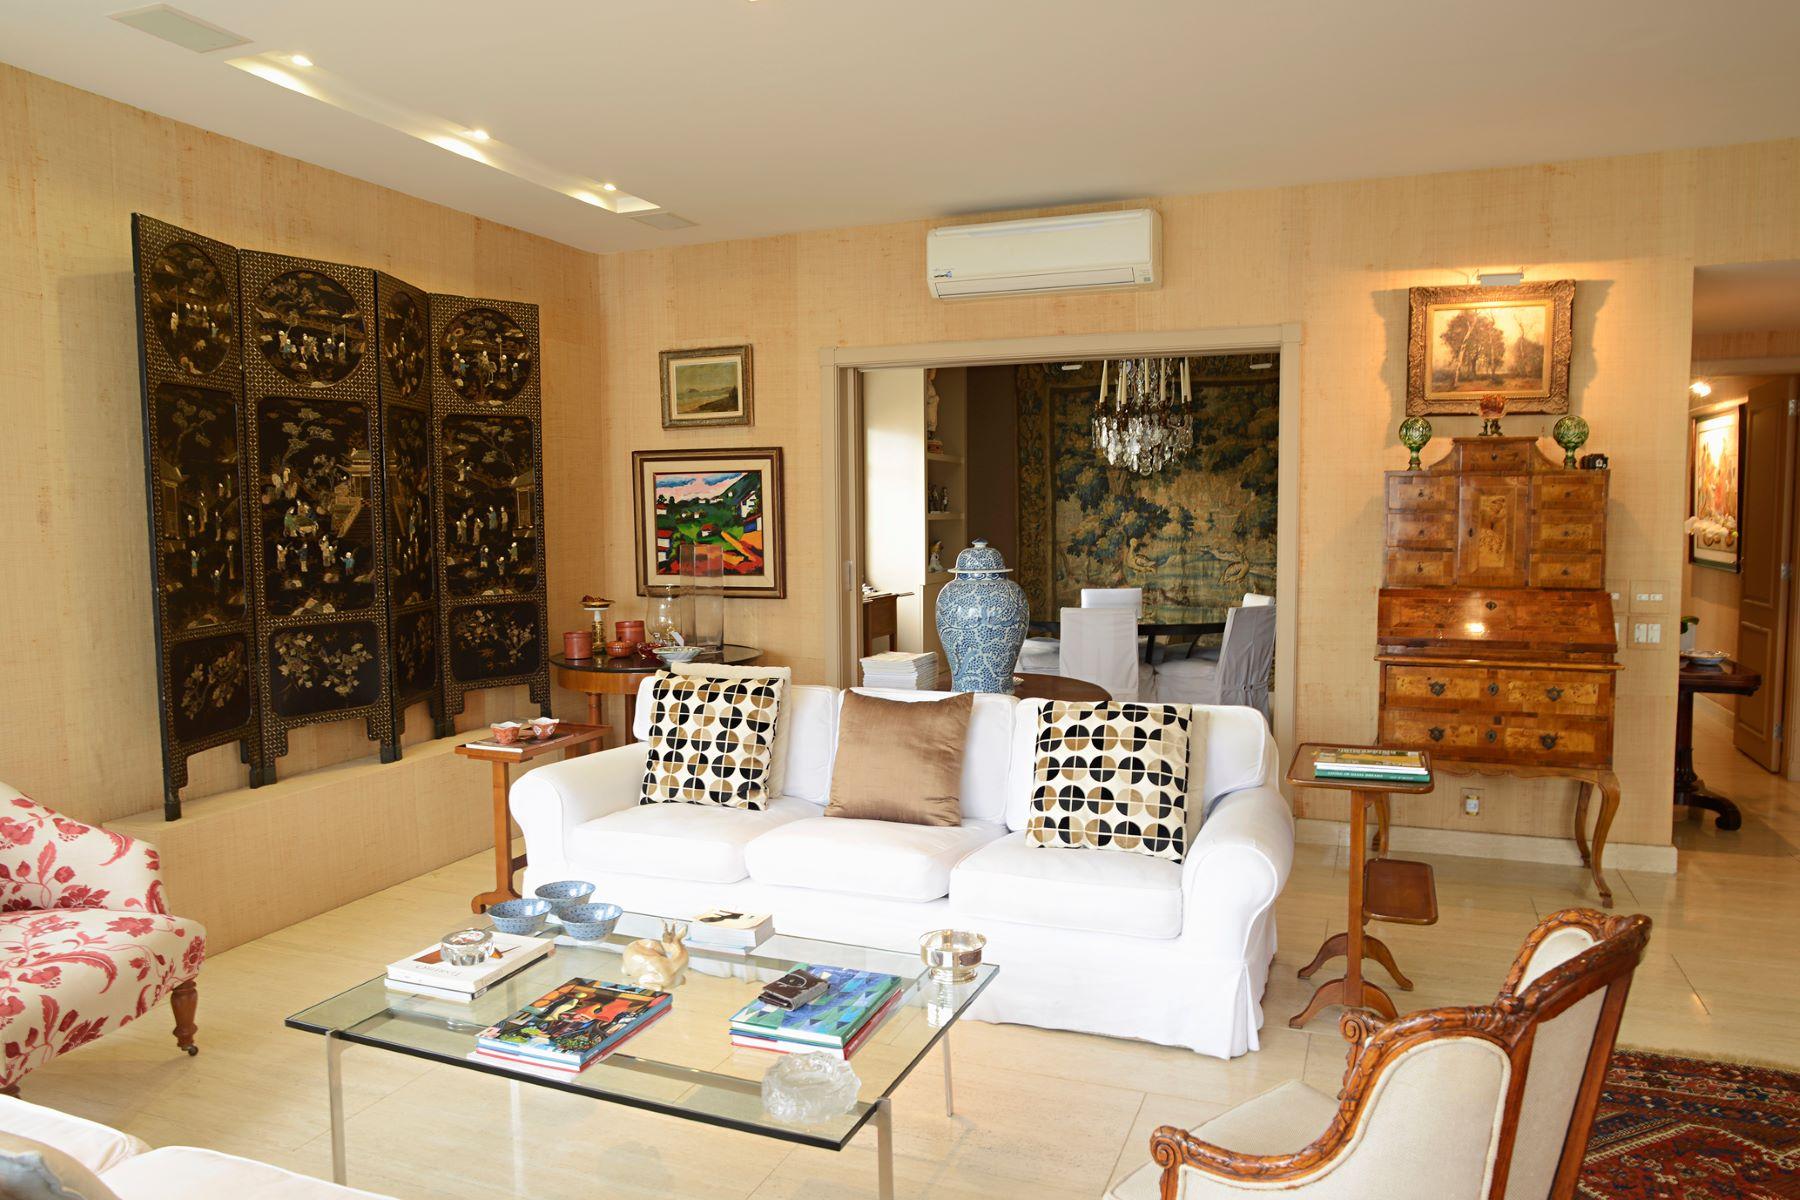 Nhà ở một gia đình vì Bán tại Elegance in Ipanema Rua Prudente de Morais Rio De Janeiro, Rio De Janeiro, 22420-043 Brazil